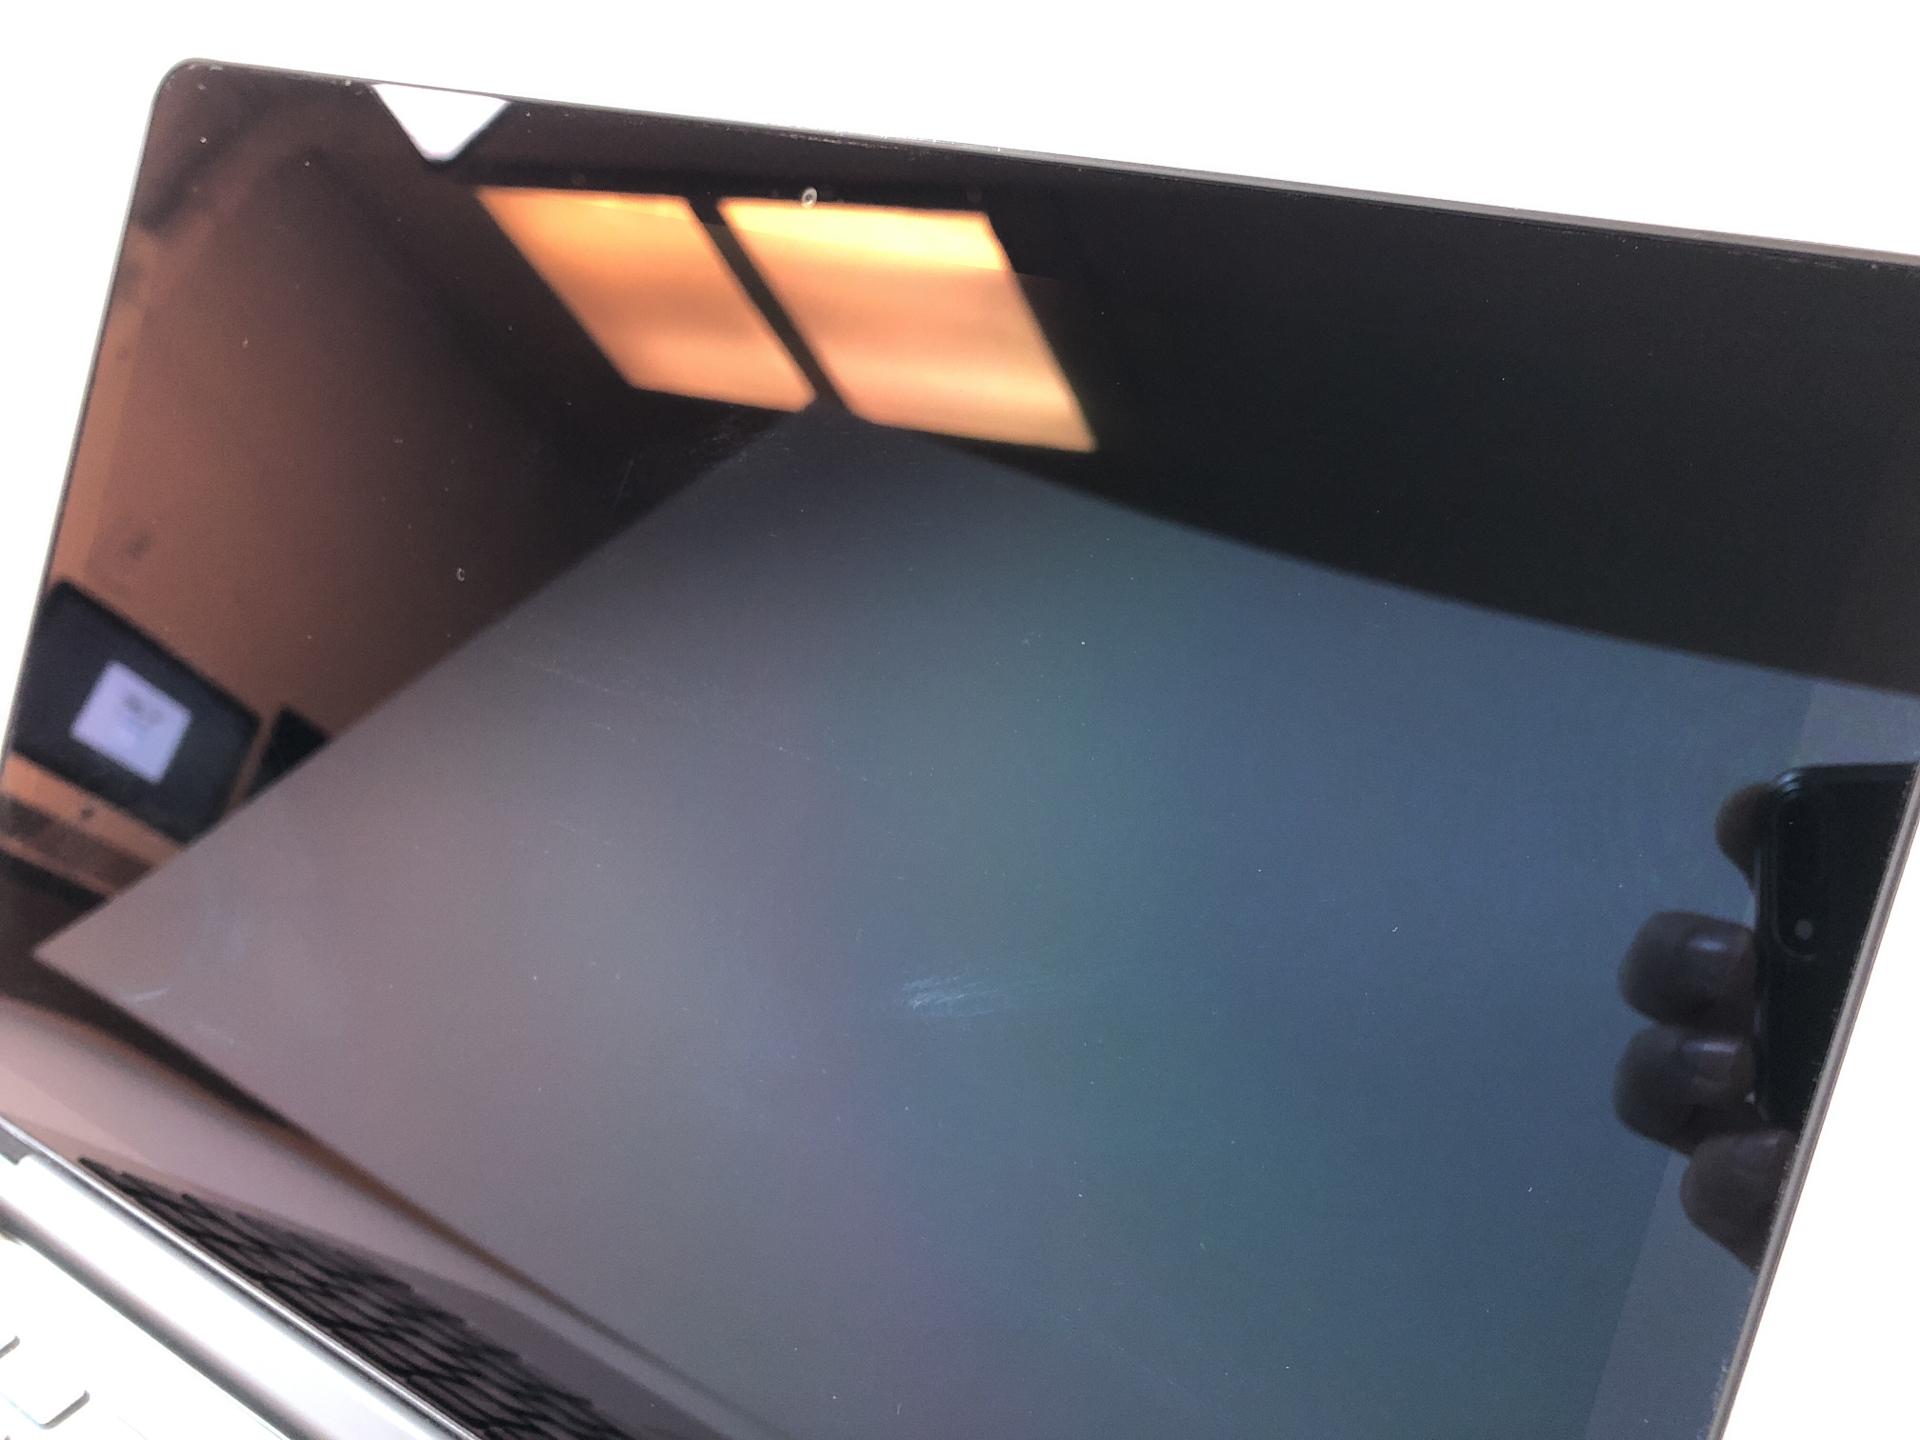 "MacBook Pro Retina 13"" Late 2013 (Intel Core i5 2.6 GHz 16 GB RAM 512 GB SSD), Intel Core i5 2.6 GHz, 16 GB RAM, 512 GB SSD, Kuva 3"